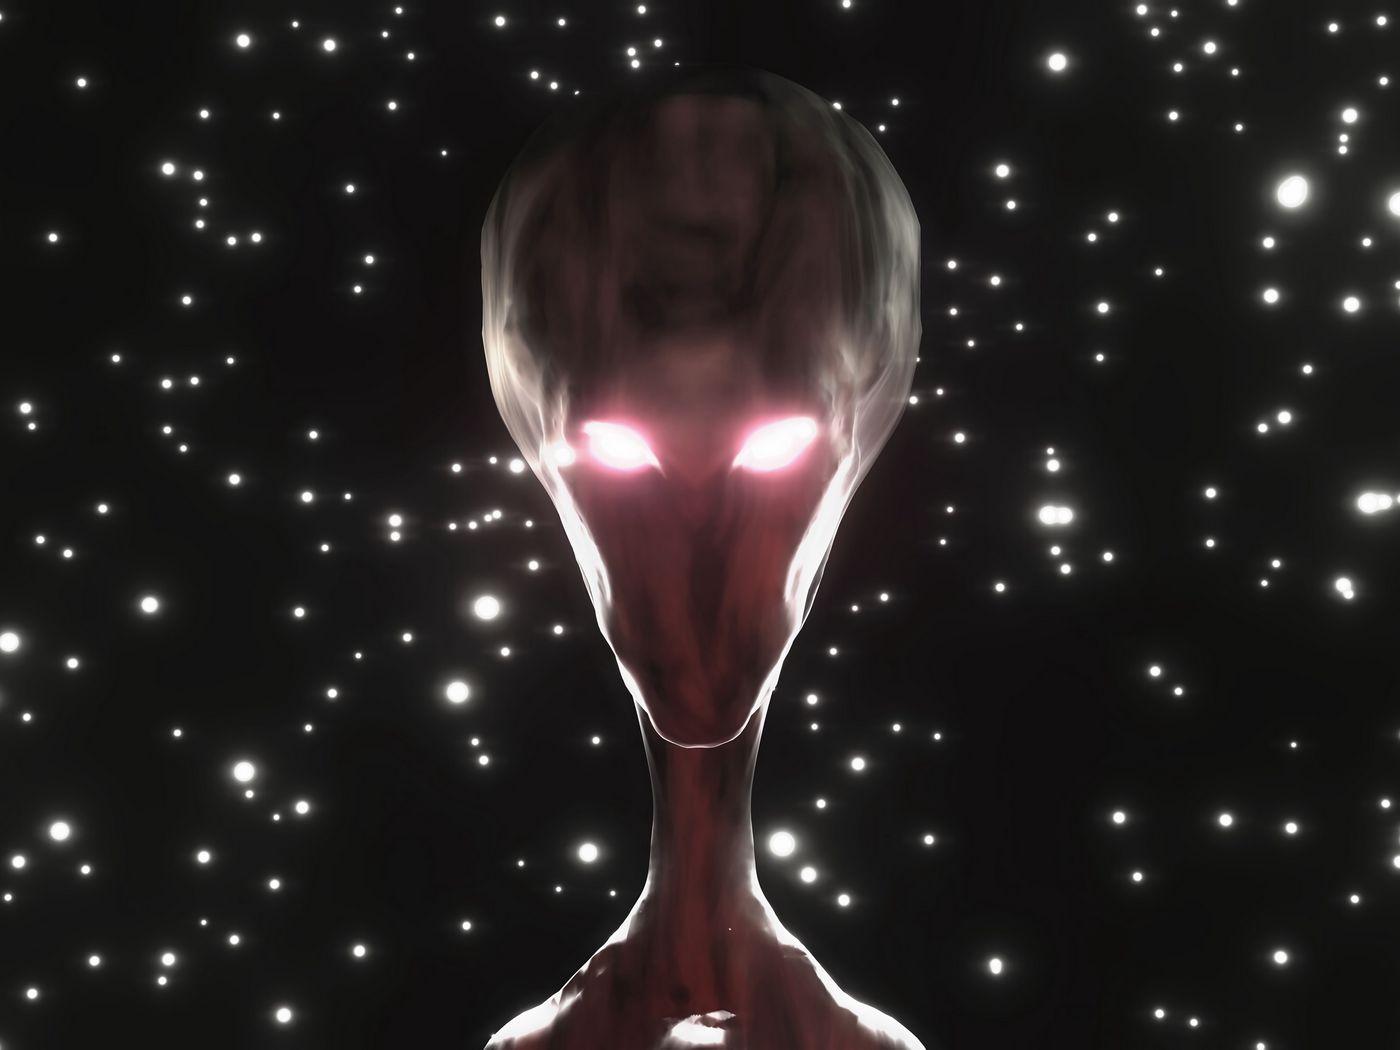 1400x1050 Wallpaper alien, humanoid, face, glow, stars